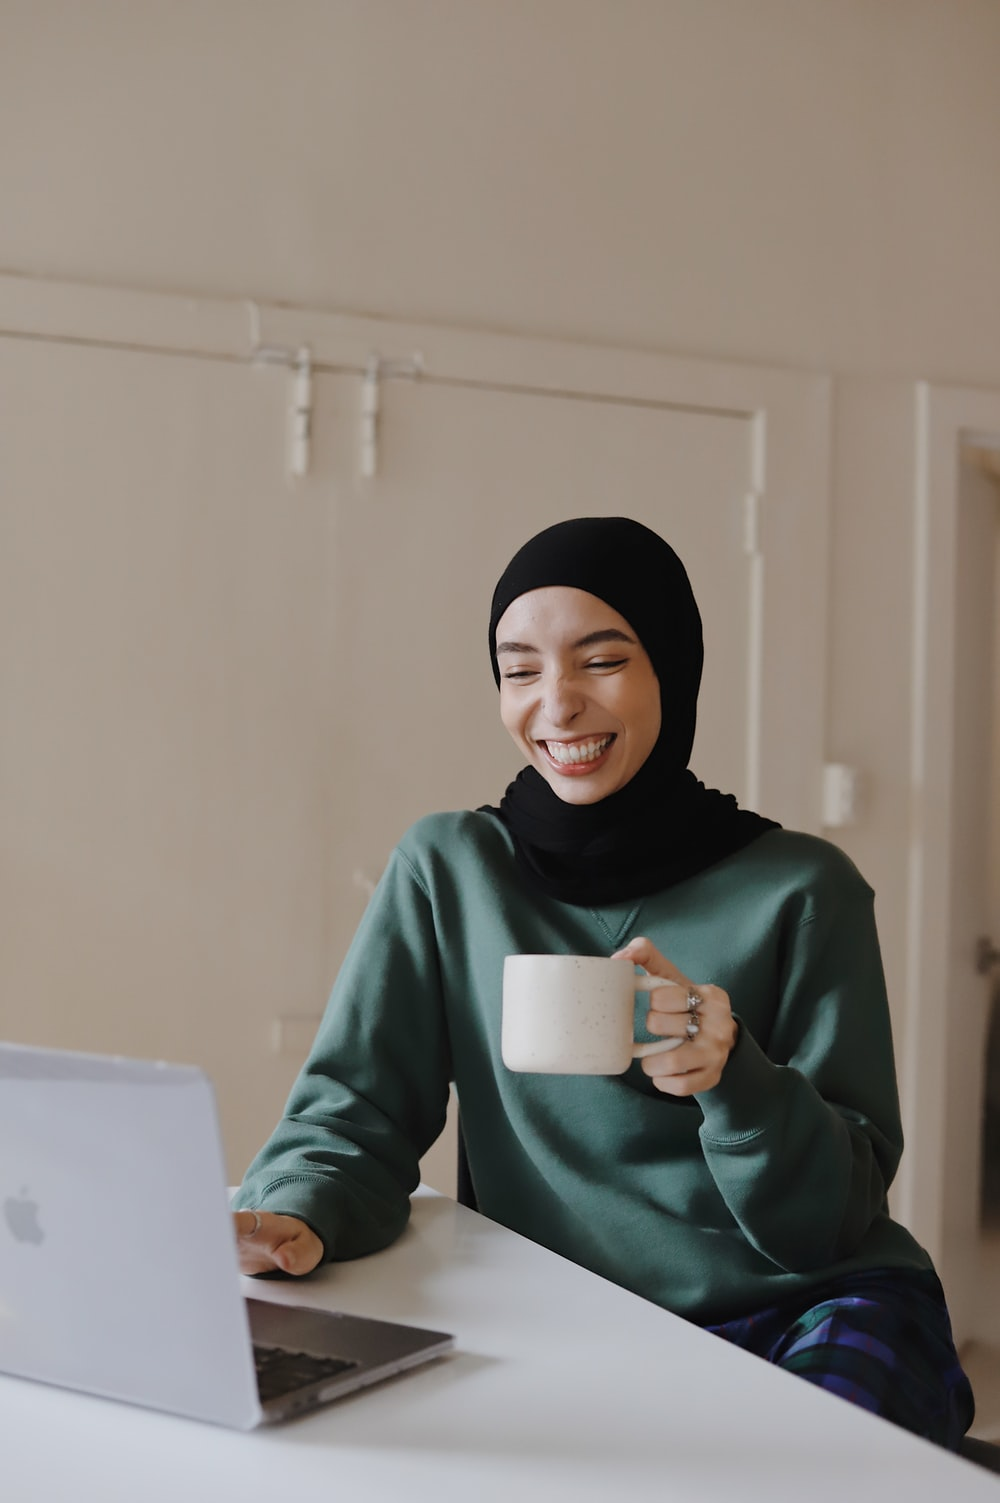 woman in green hijab holding white ceramic mug